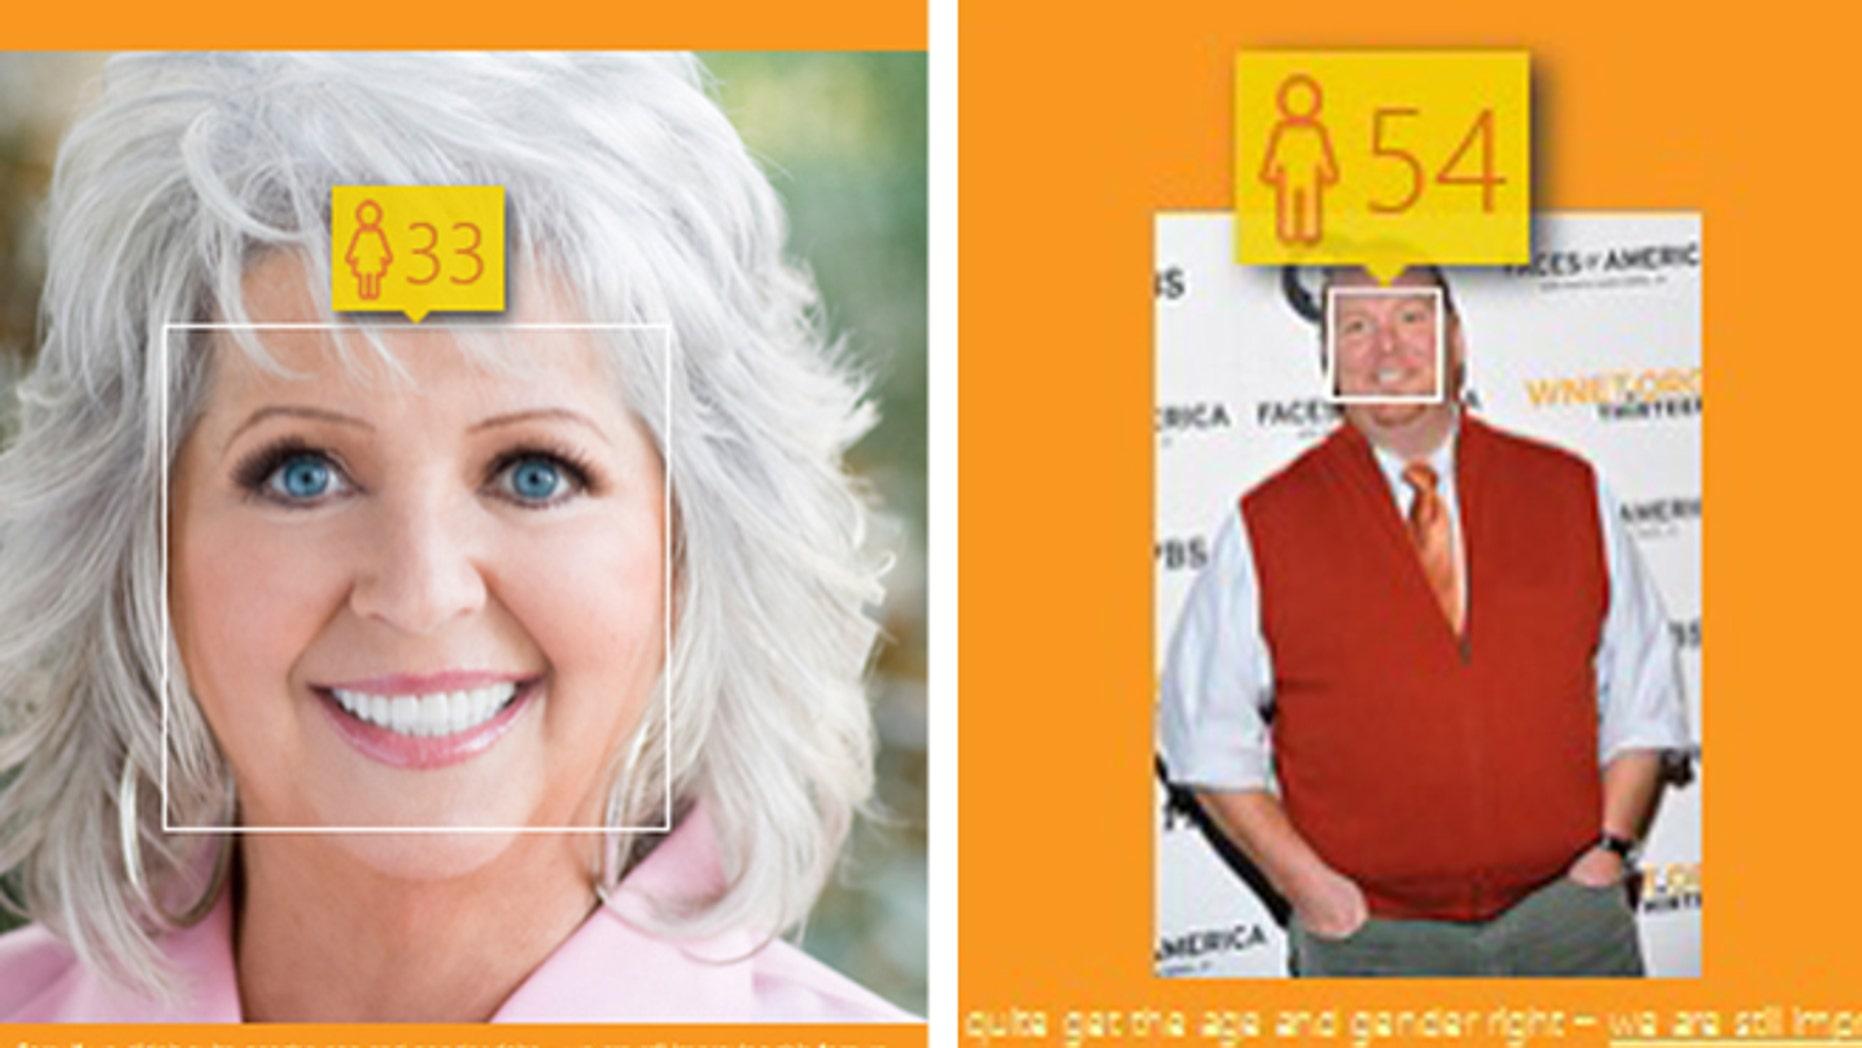 Is Paula Deen really 33?